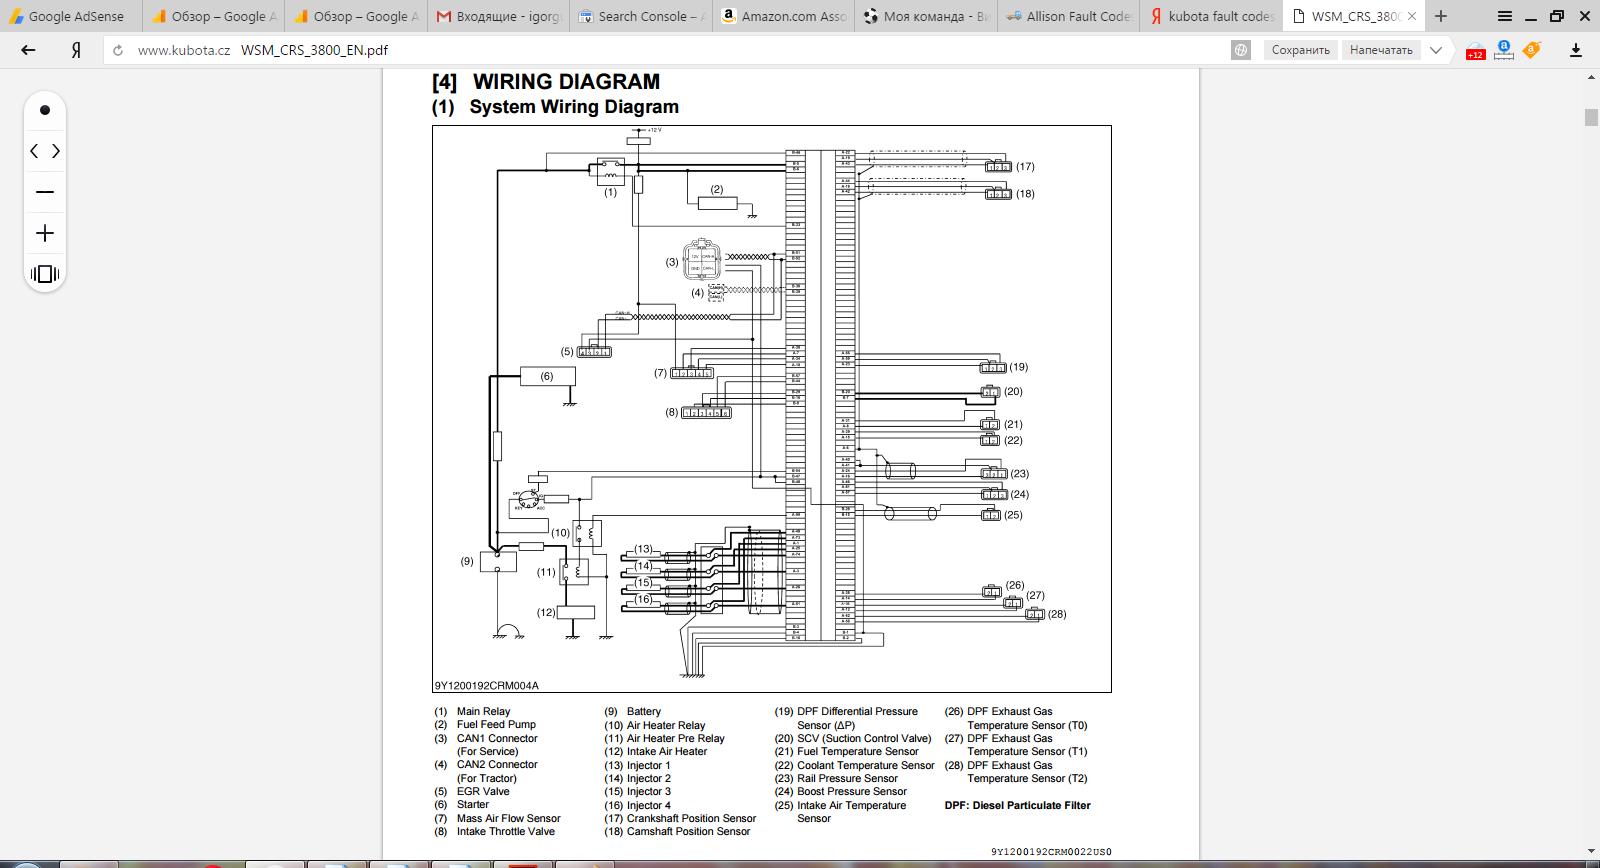 kubota wiring schematics - wiring diagram paper on kubota l3830 wiring  diagram, kubota l2350 wiring